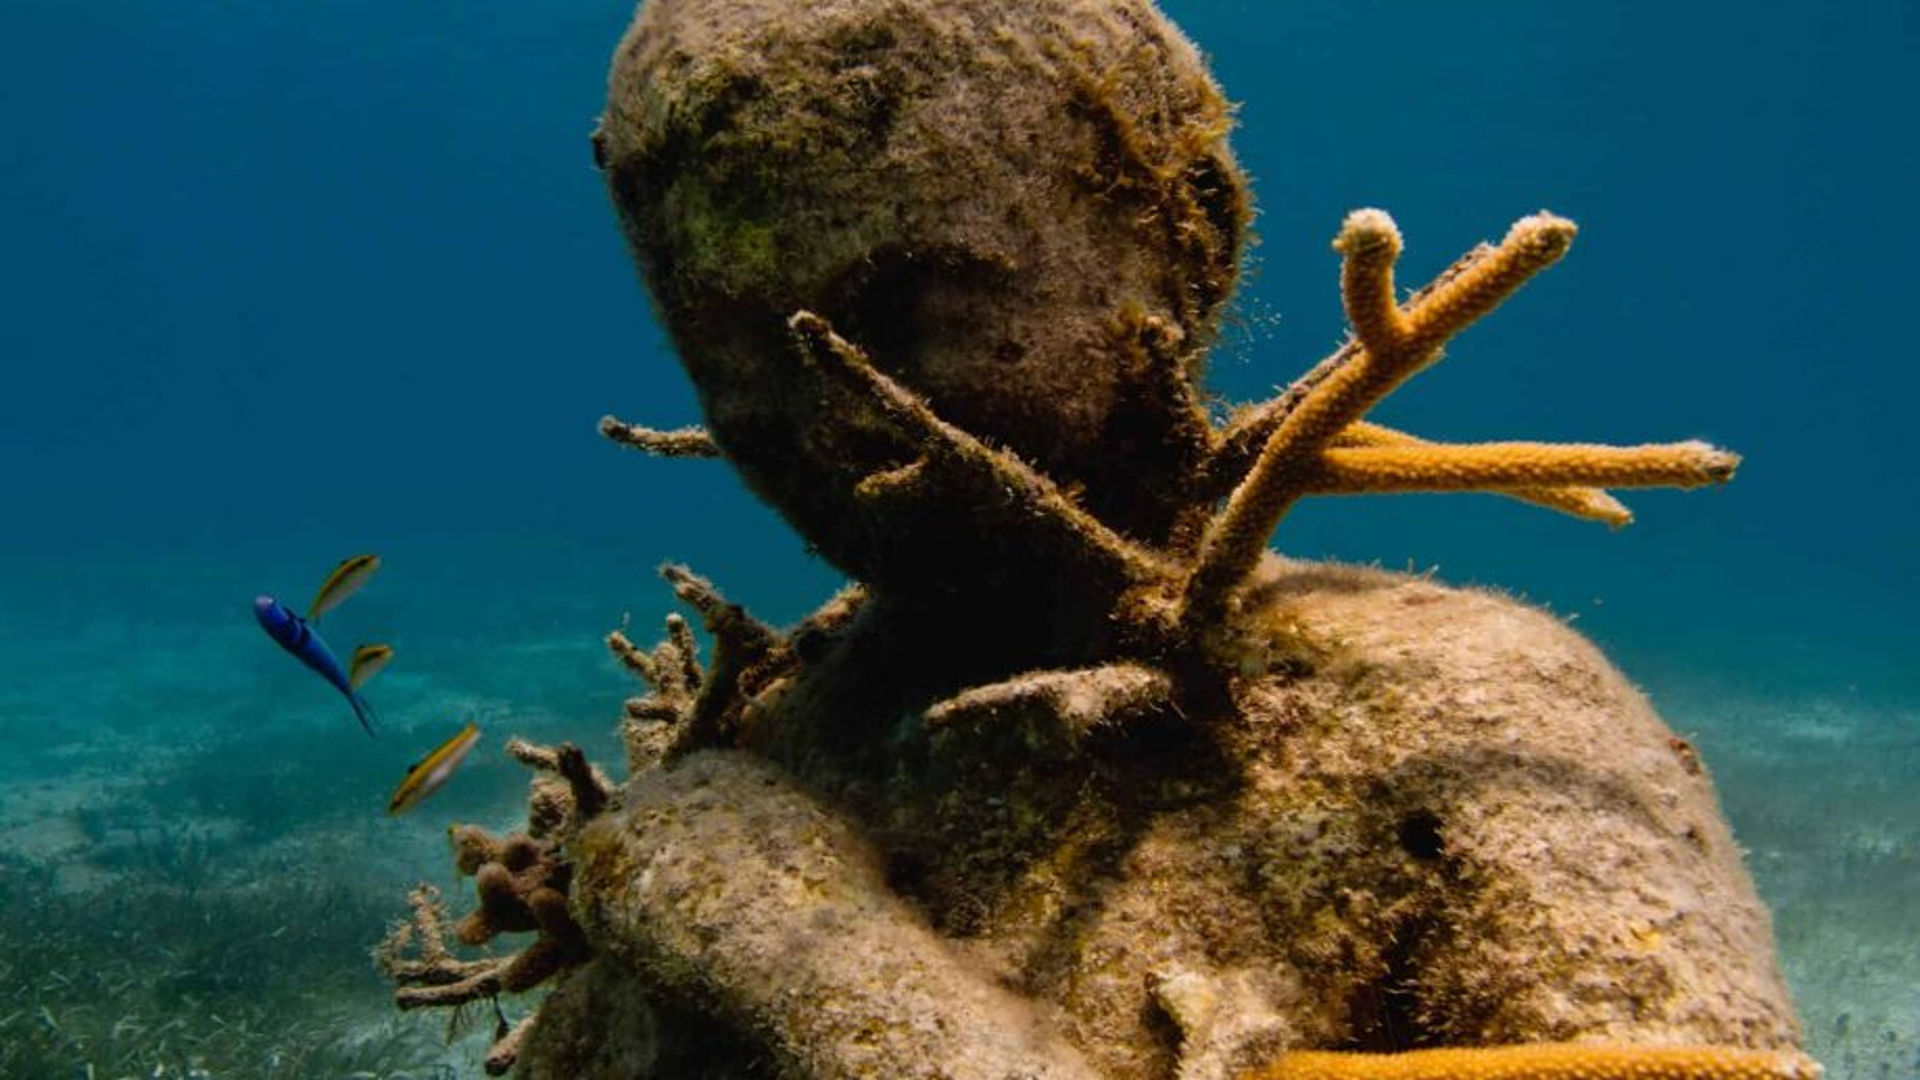 Underwater sculptures: creating life and awareness